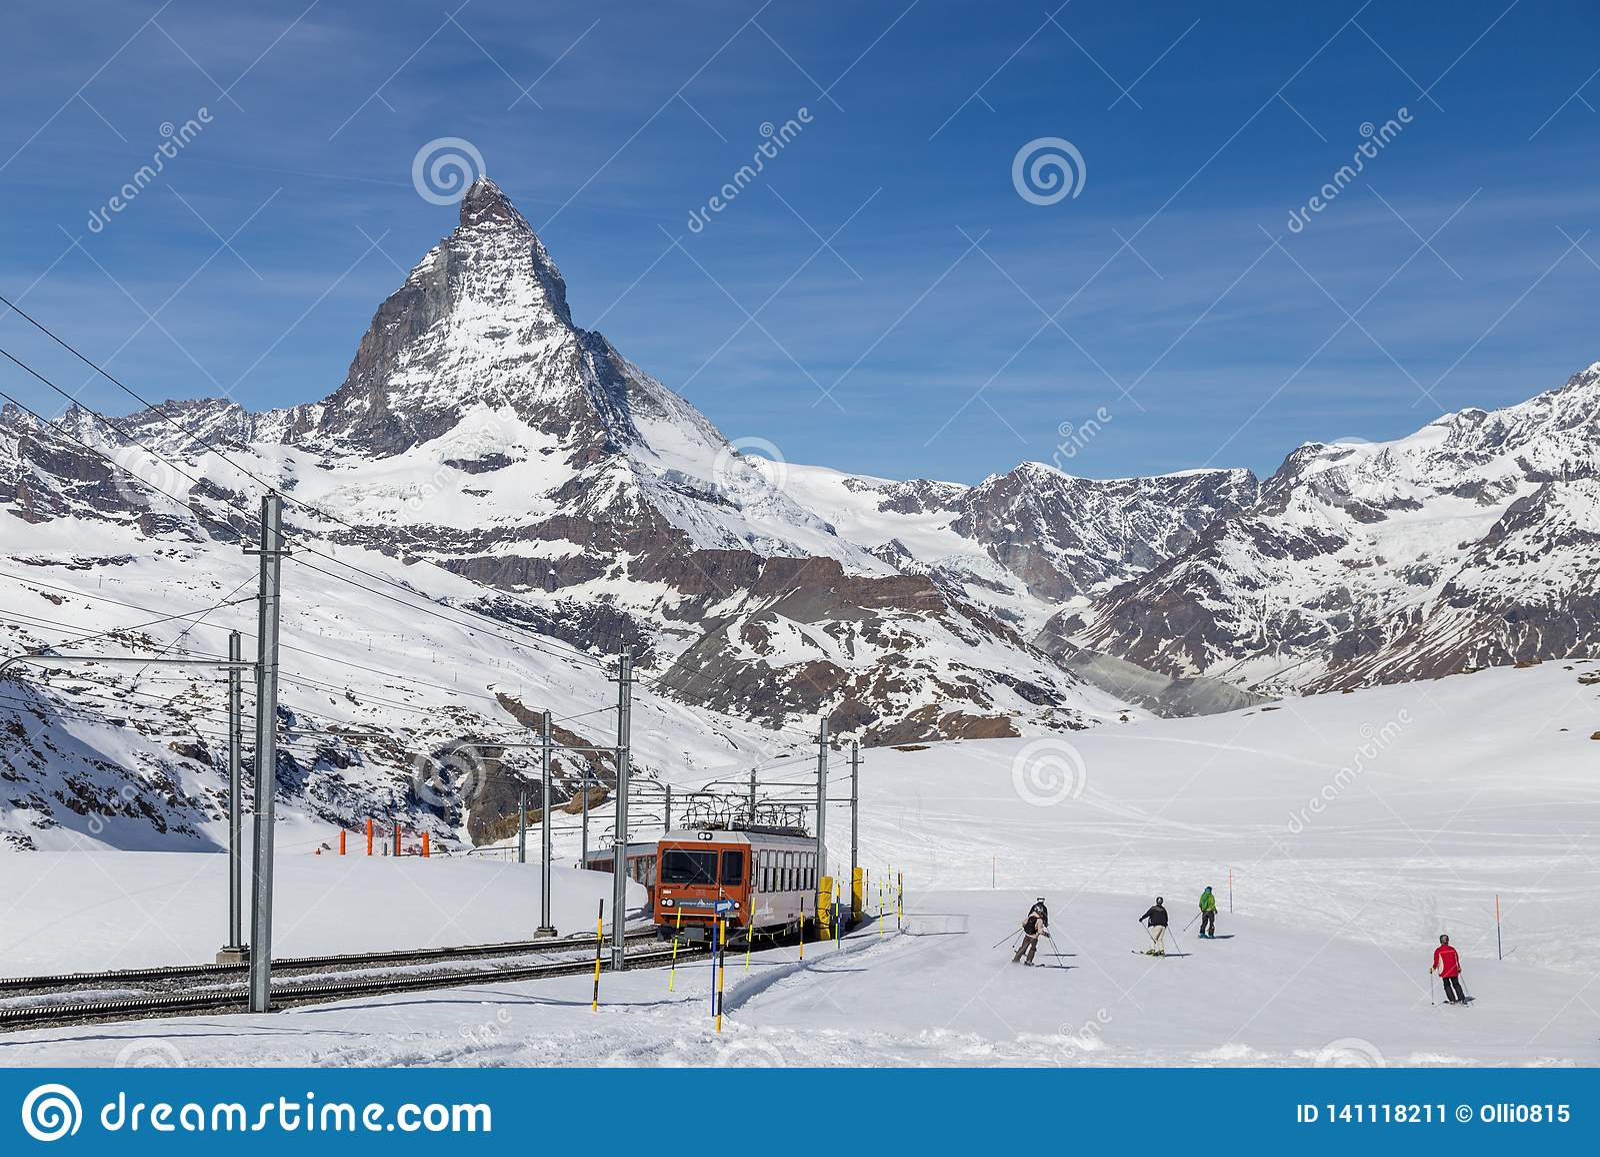 Gornergrat Train and people skiing in front of Matterhorn